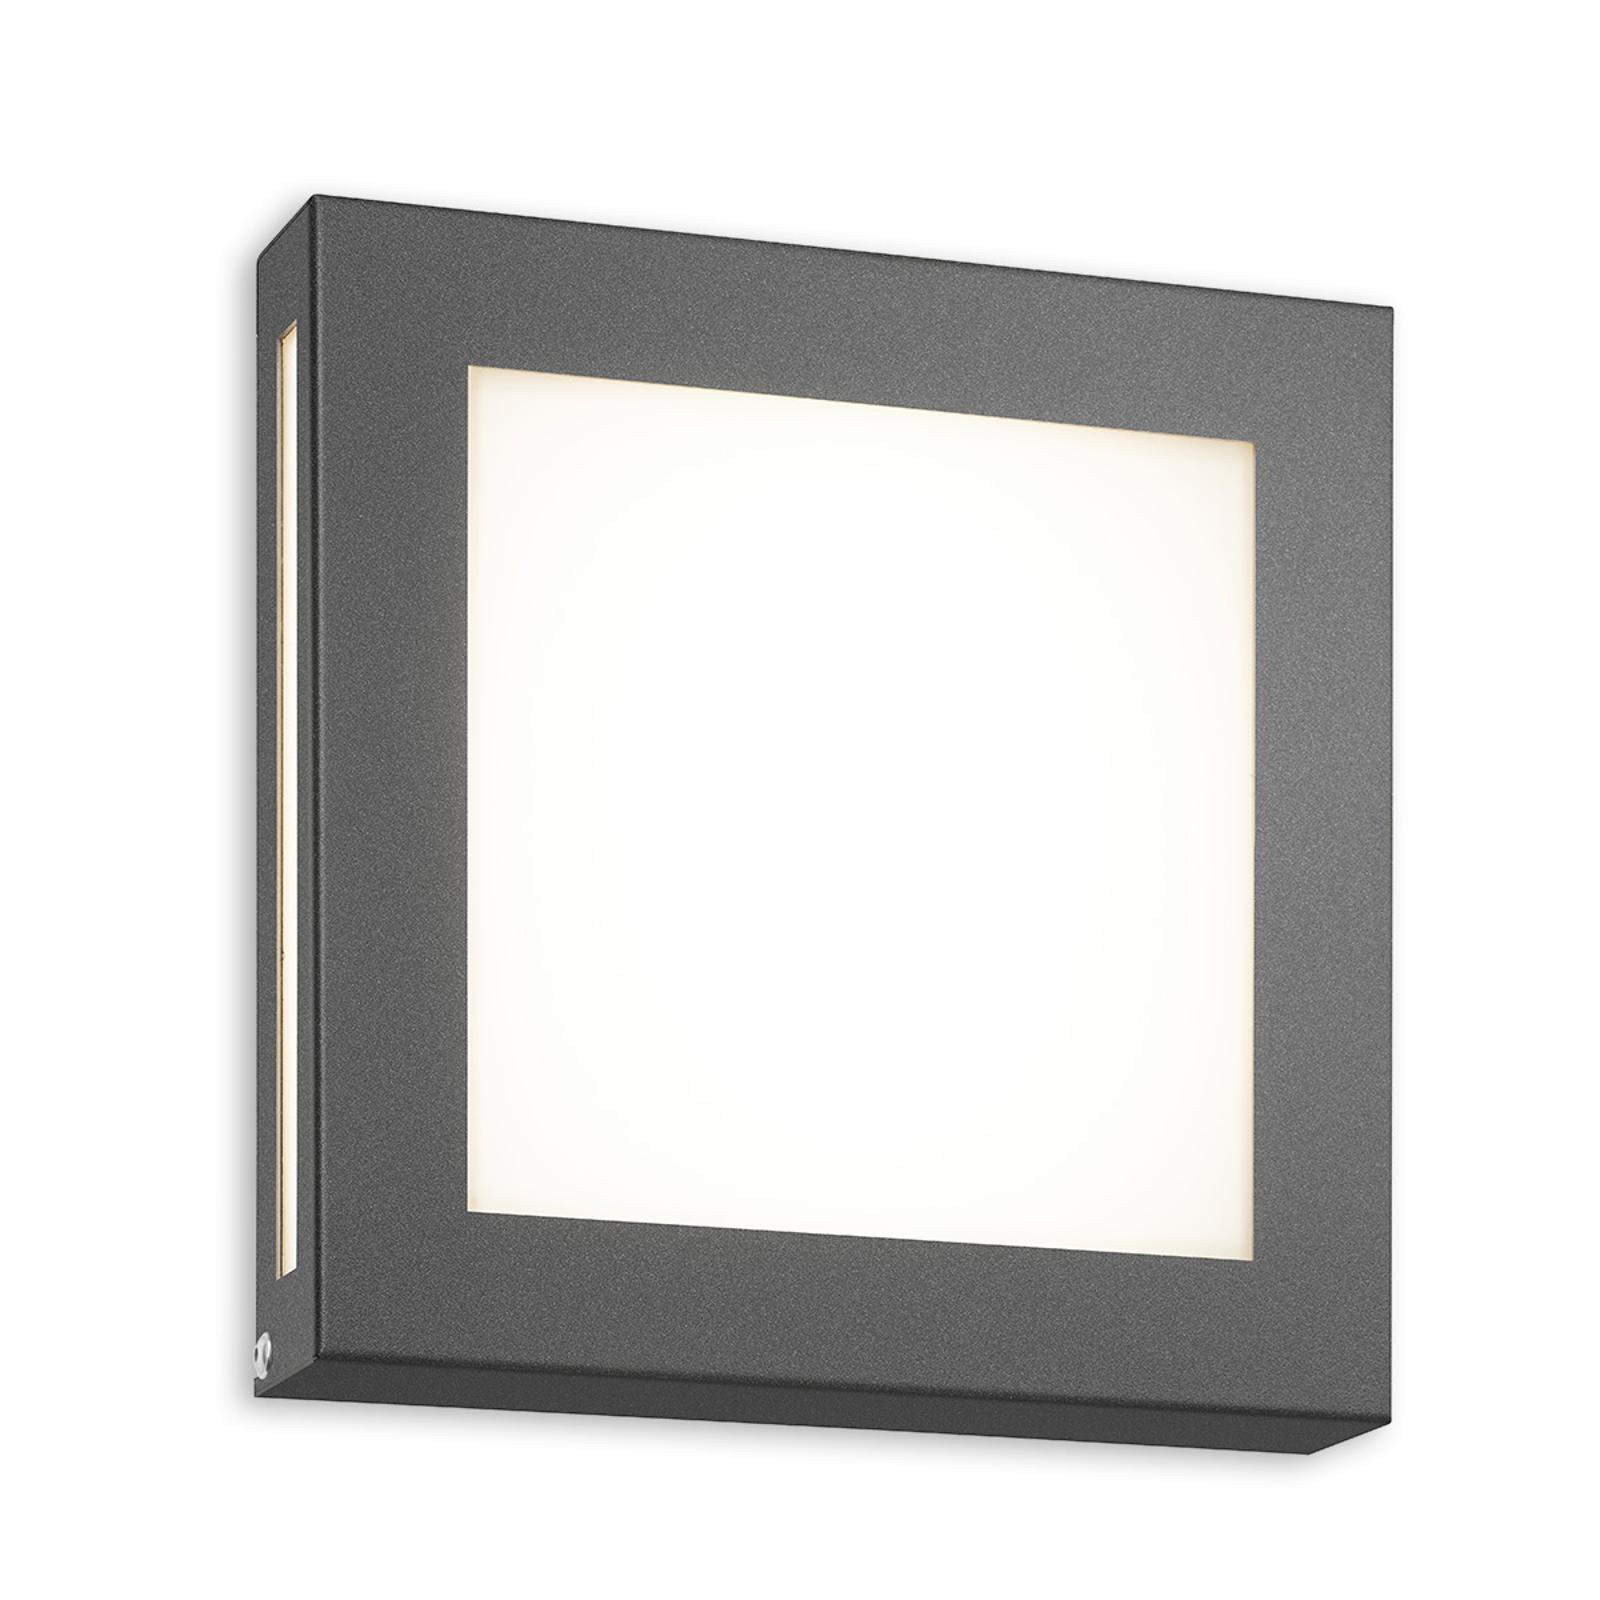 Lampada parete esterni LED antracite Legendo Mini